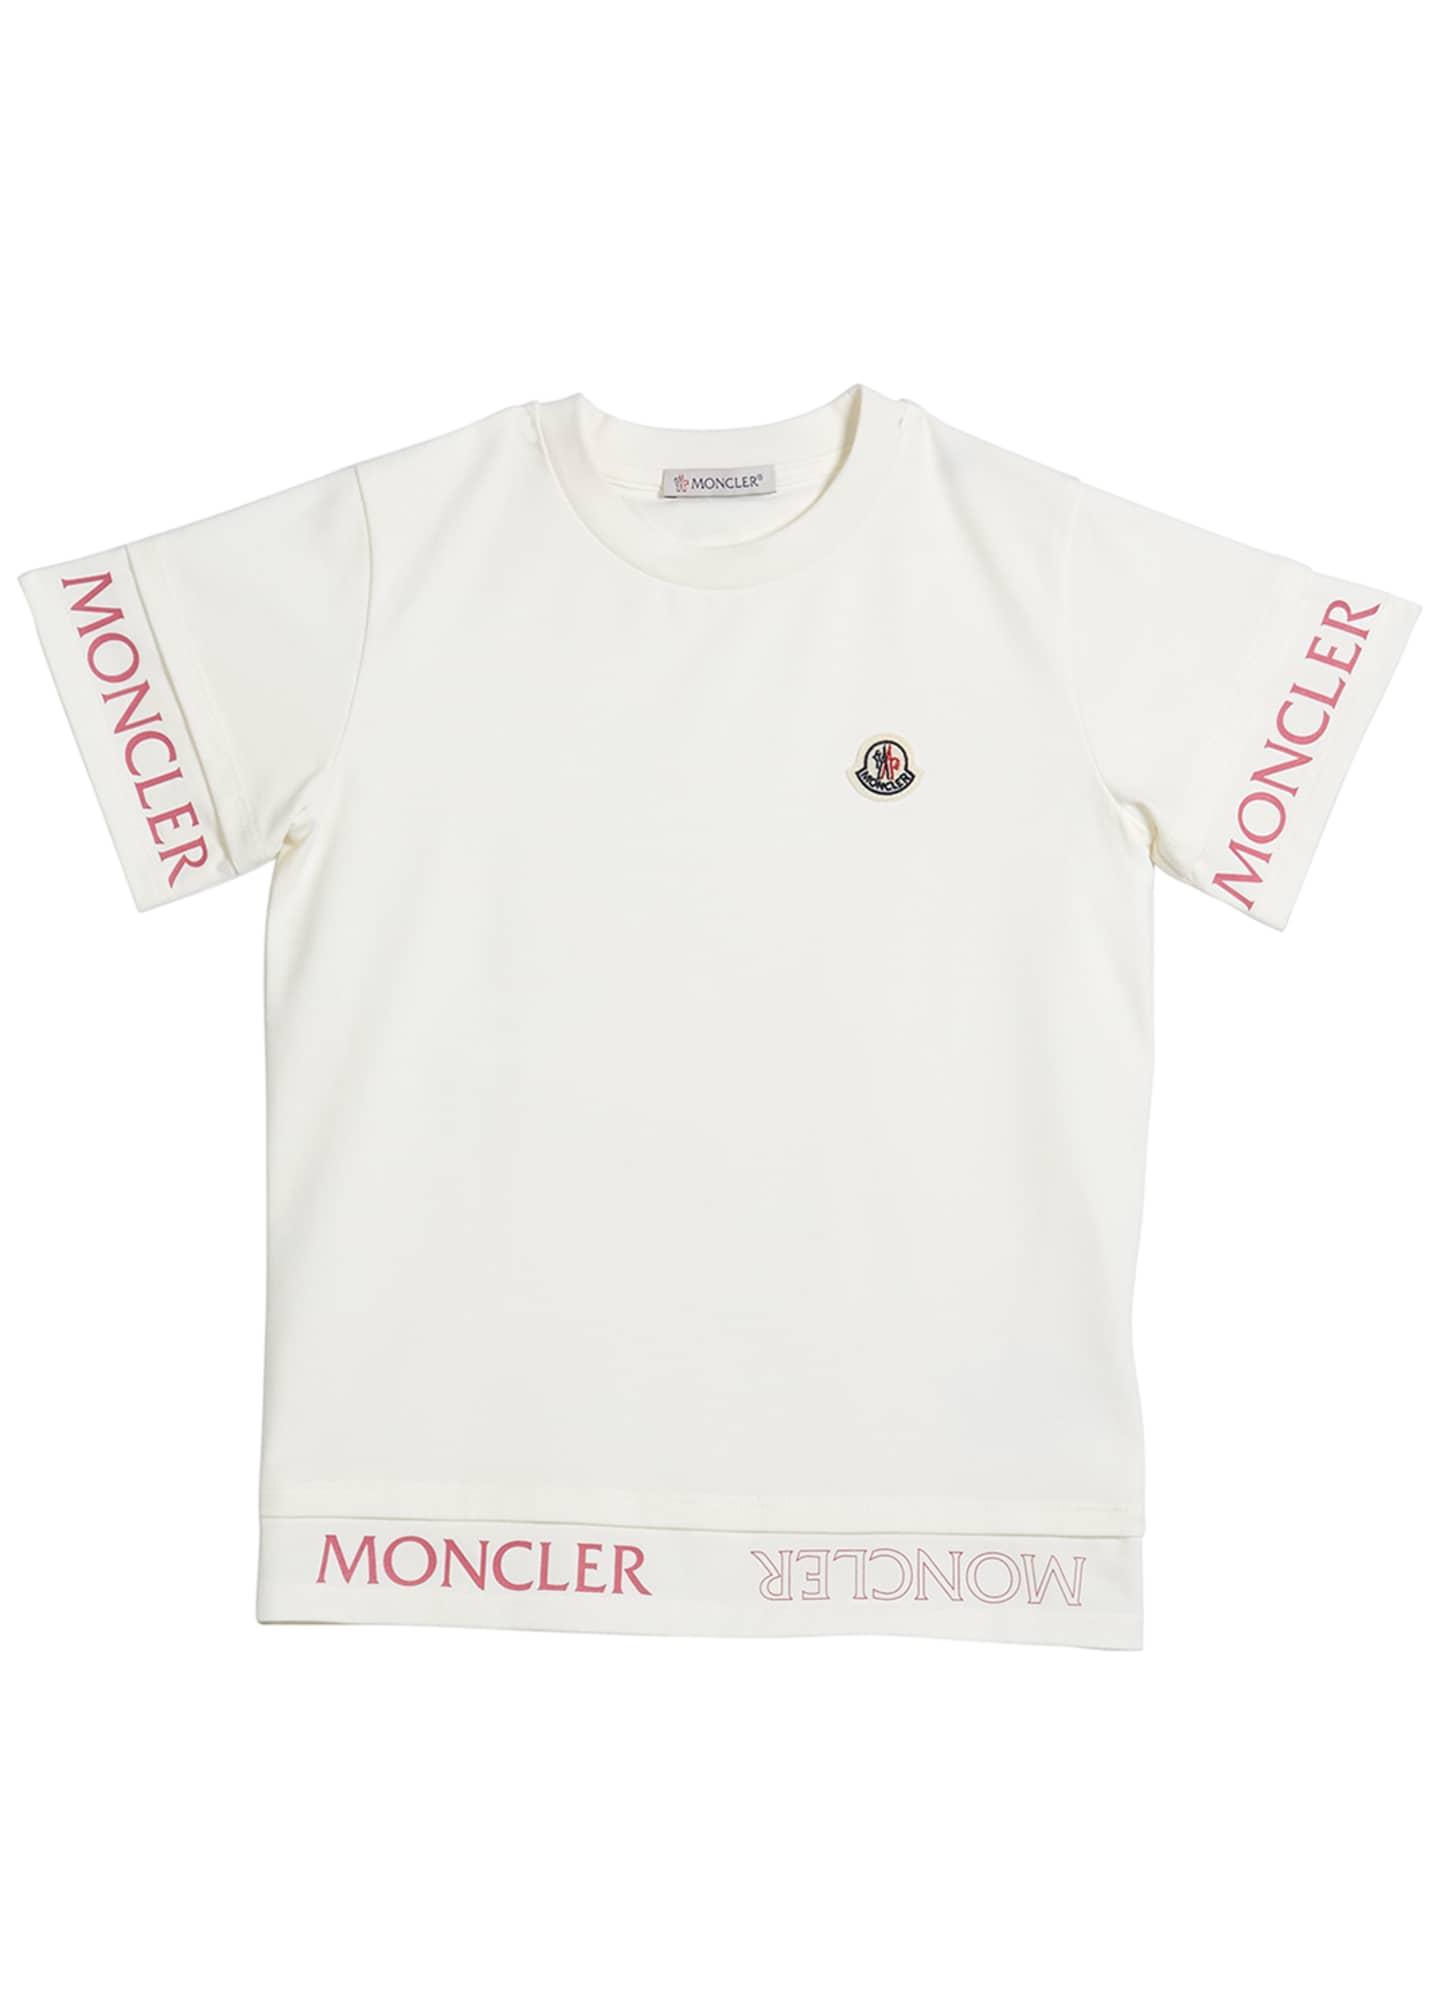 Moncler Girl's Logo Trim Short-Sleeve T-Shirt, Size 8-14